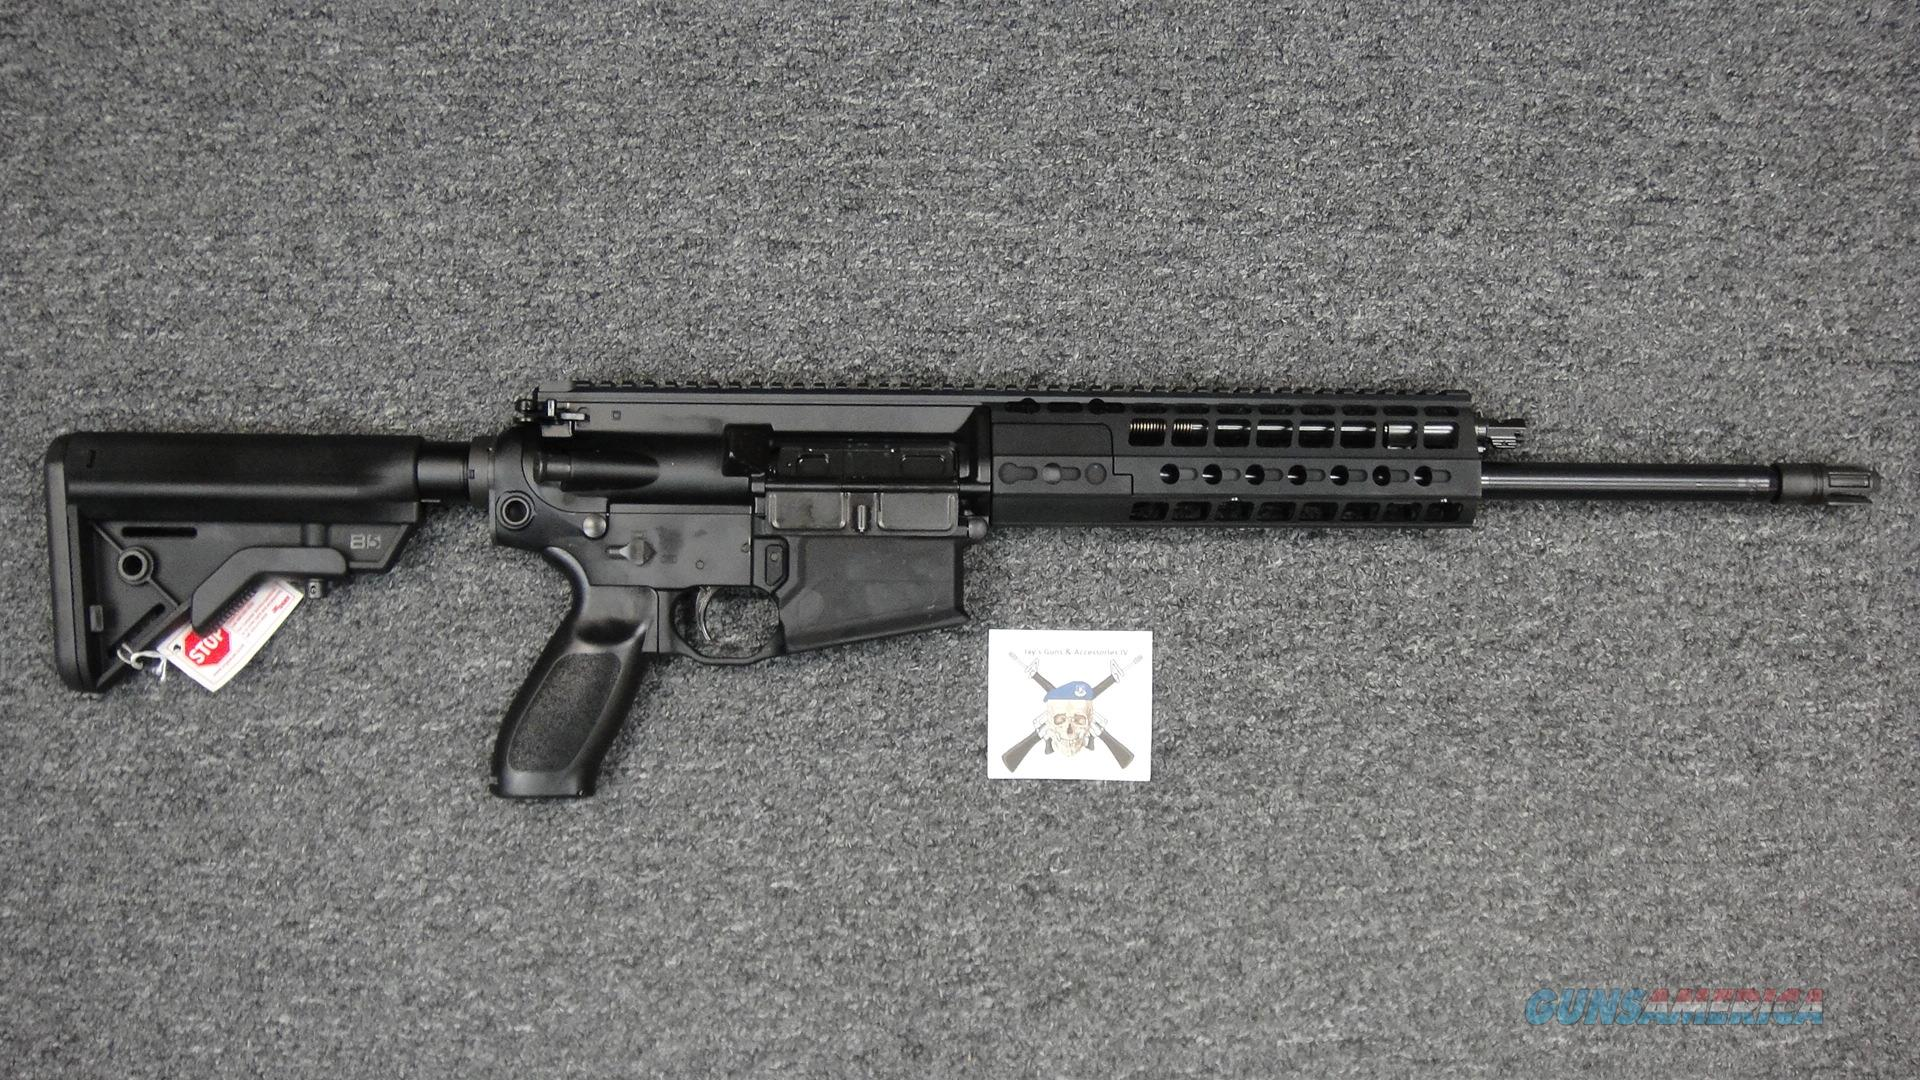 Sig Sauer 716G2 Patrol Rifle 7.62 NATO  Guns > Rifles > Sig - Sauer/Sigarms Rifles